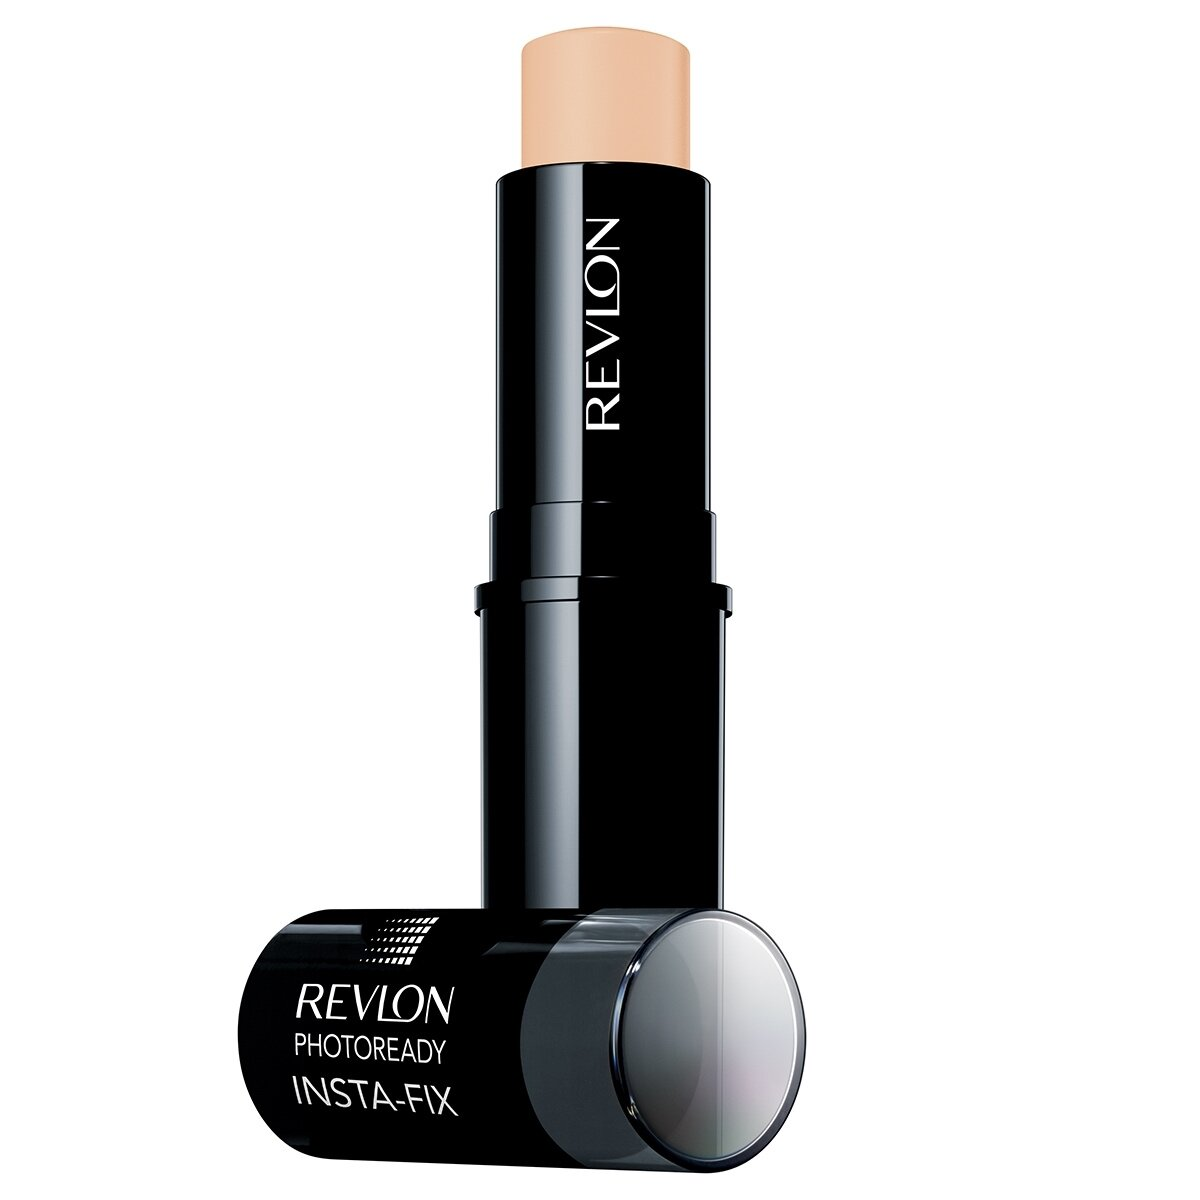 Photoready Insta Fix Makeup Shell